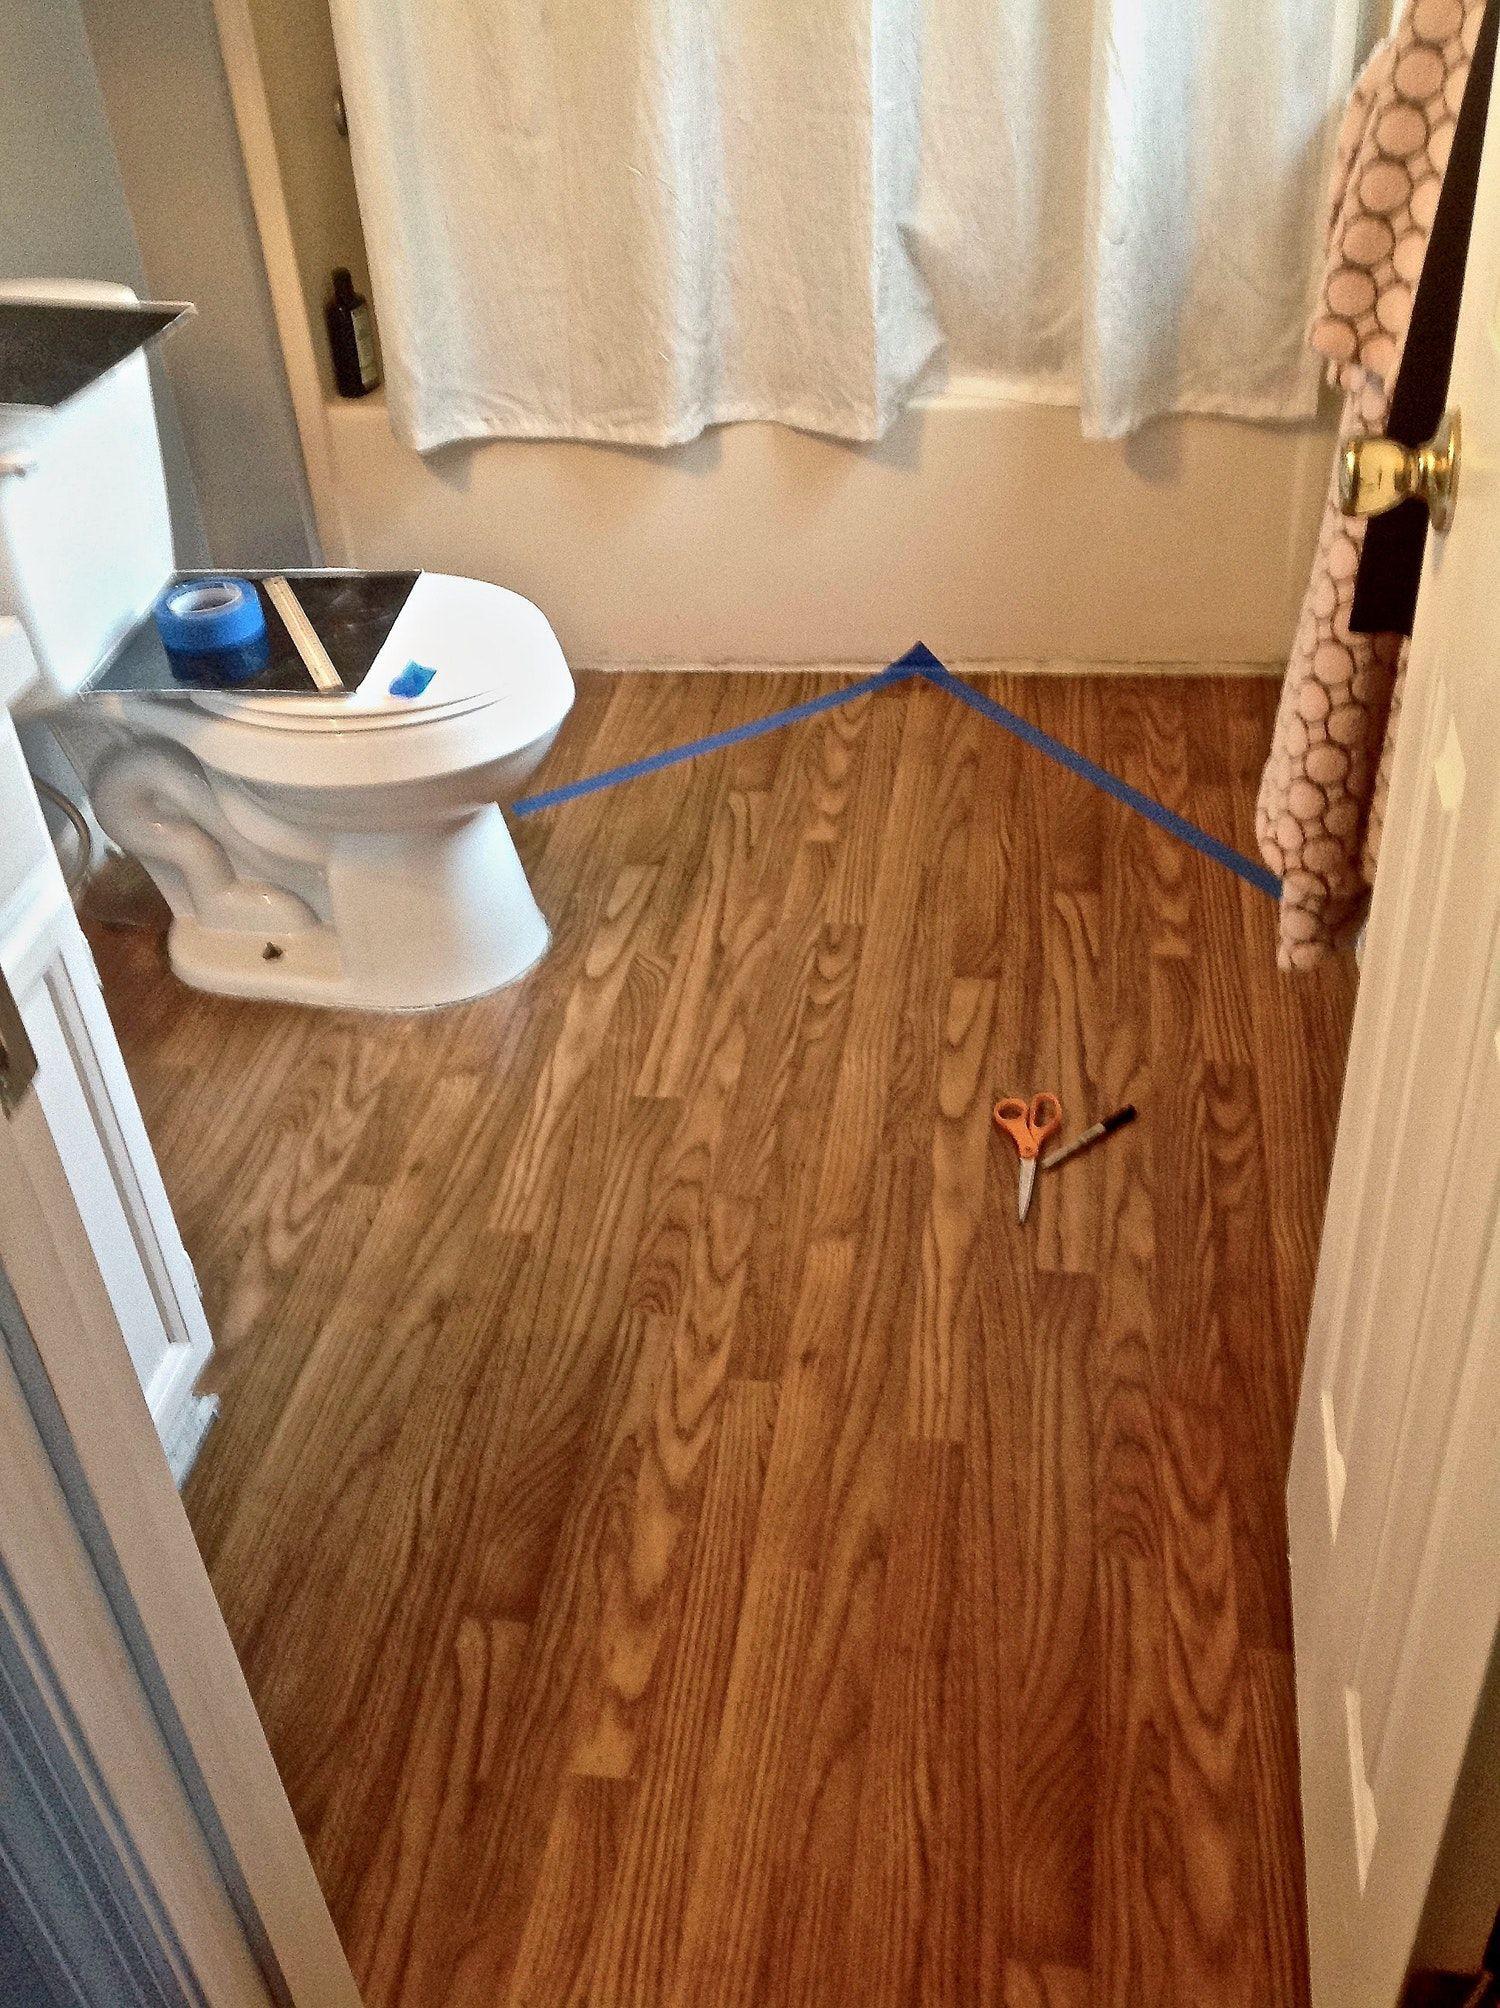 hardwood flooring charleston sc of meghans 10 bathroom floor makeover bathroom hacks bedrooms and inside meghans 10 bathroom floor makeover